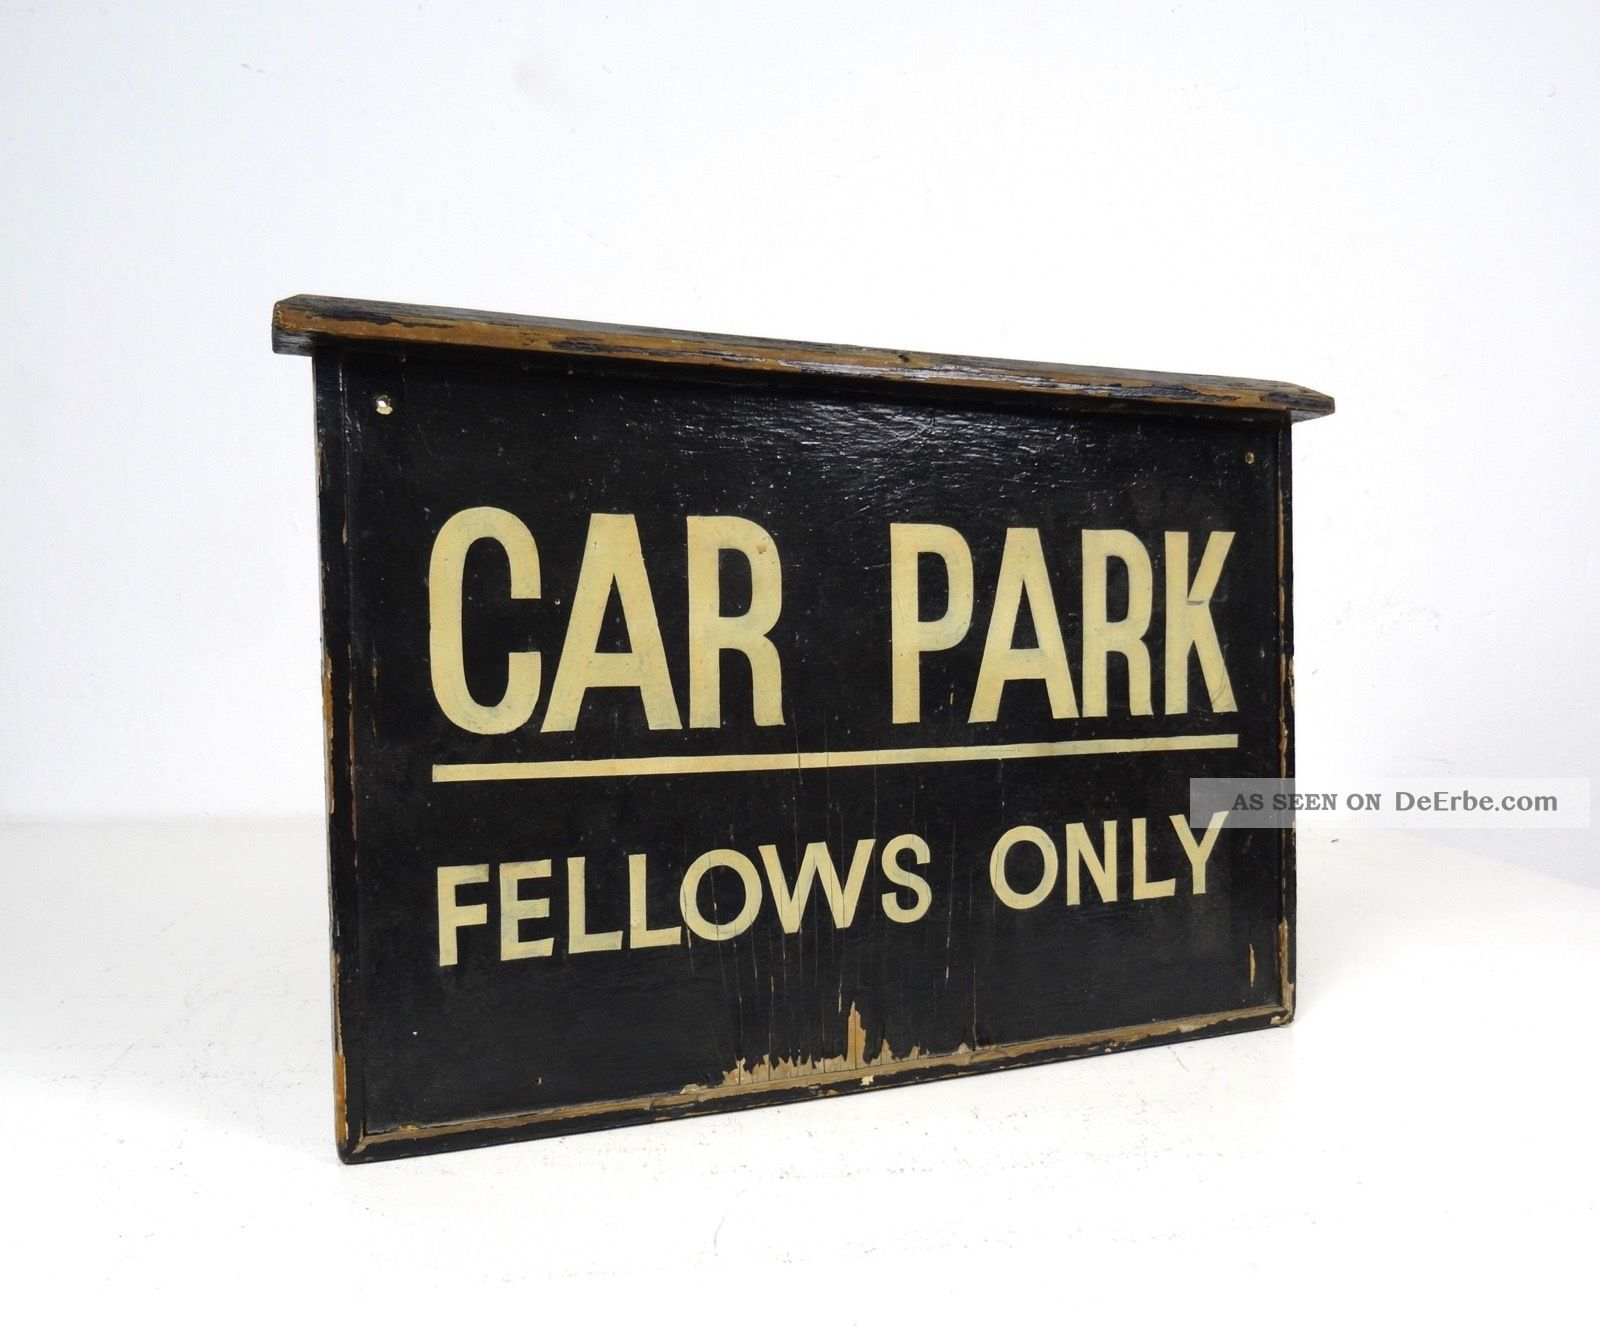 Antikes Holz Parkplatz Schild England Um 1930 Art Deco Straßenverkehr 1920-1949, Art Déco Bild